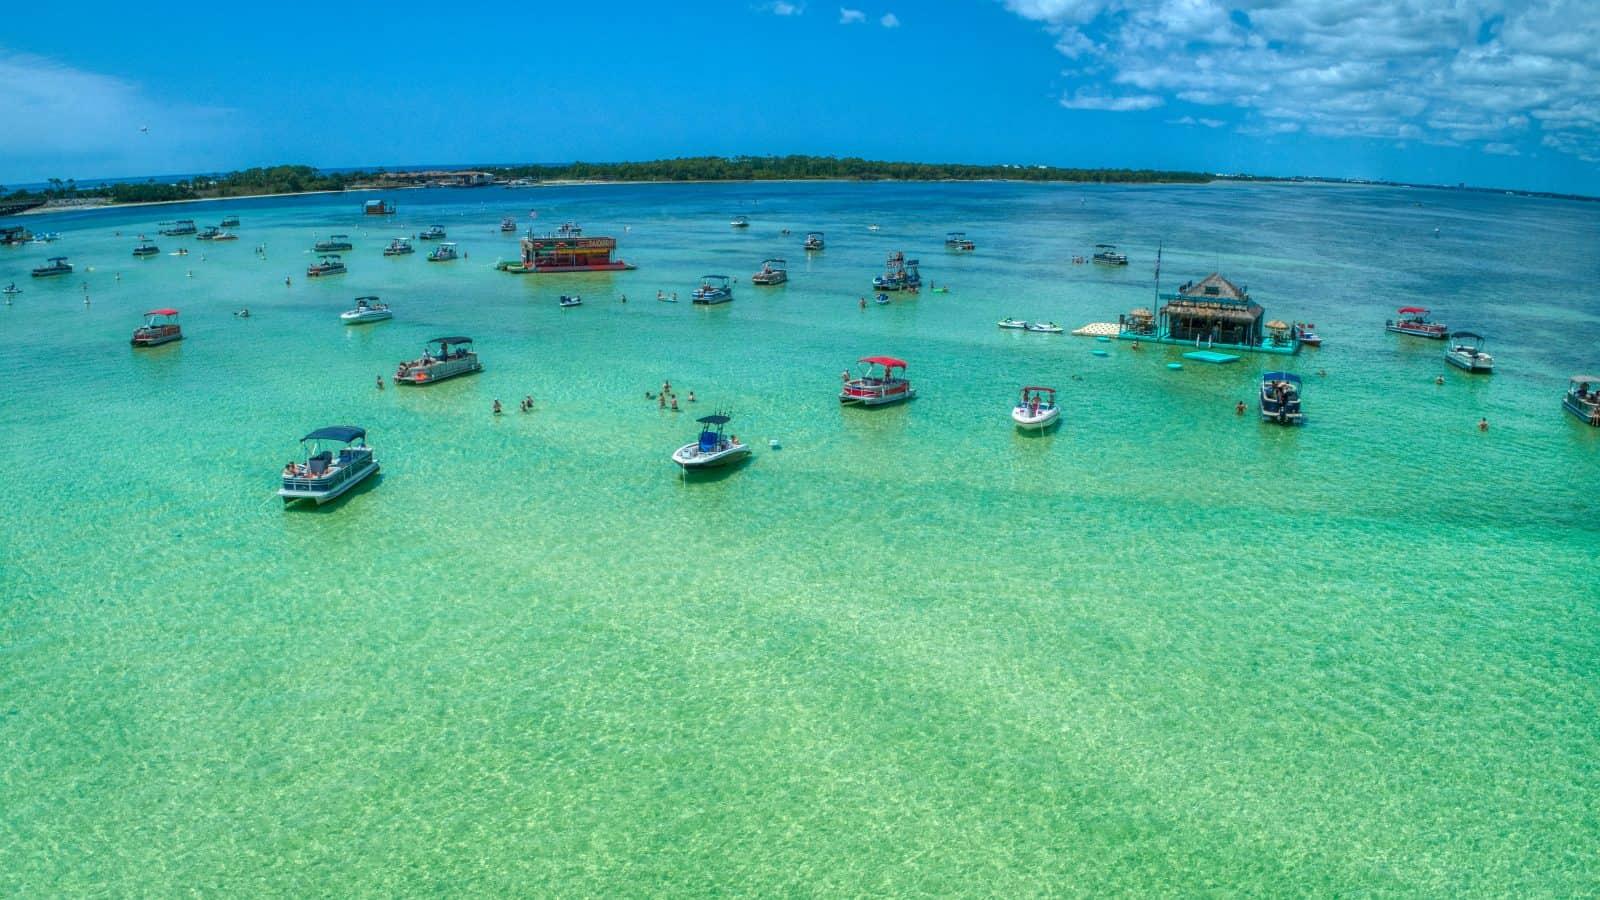 boats in Destin Florida